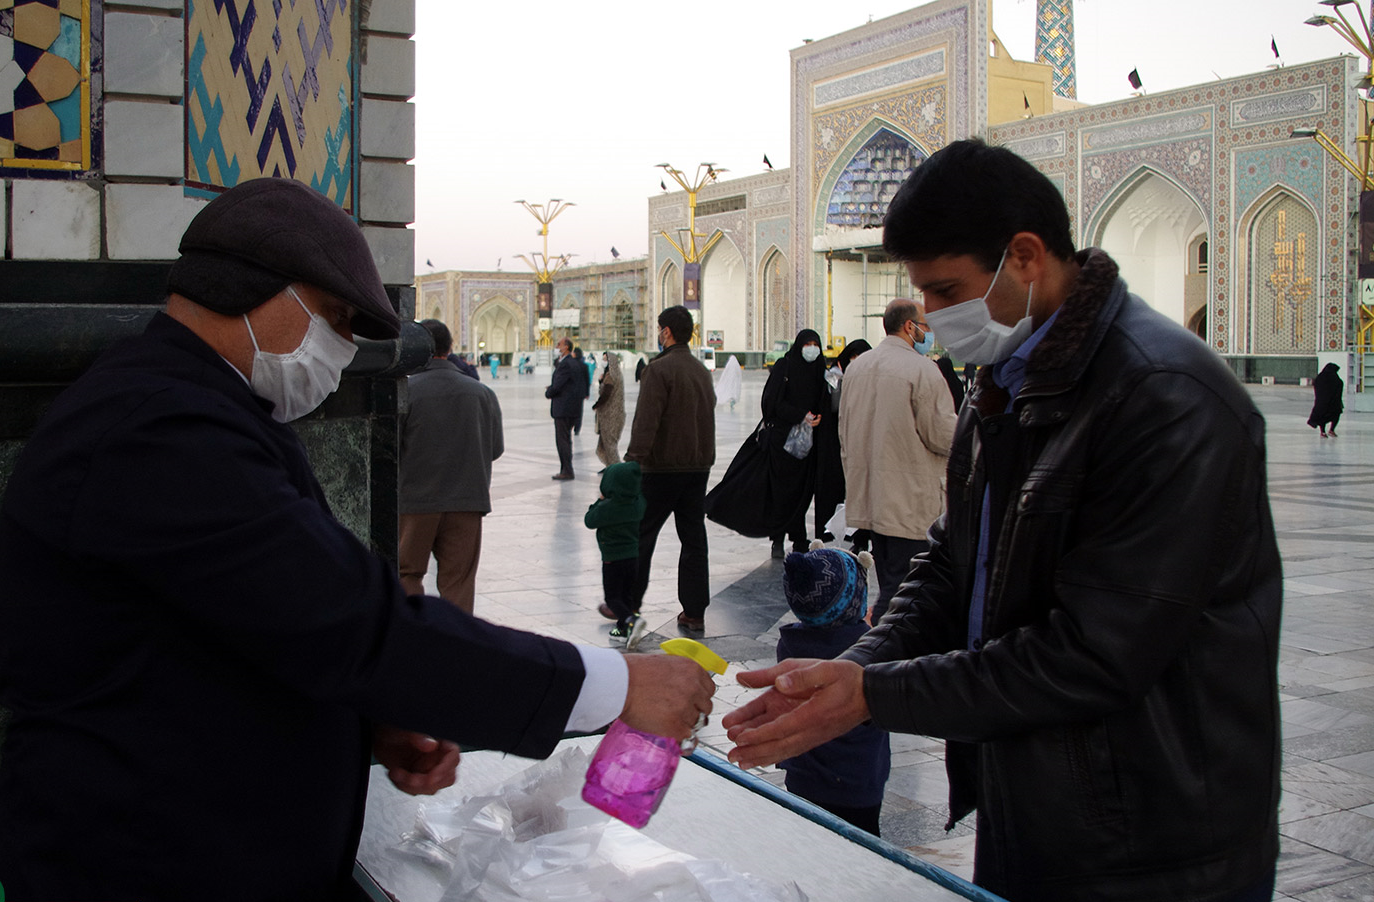 13990819000161 Test NewPhotoFree - تمهیدات شدید بهداشتی در حرم امام رضا (ع)+عکس